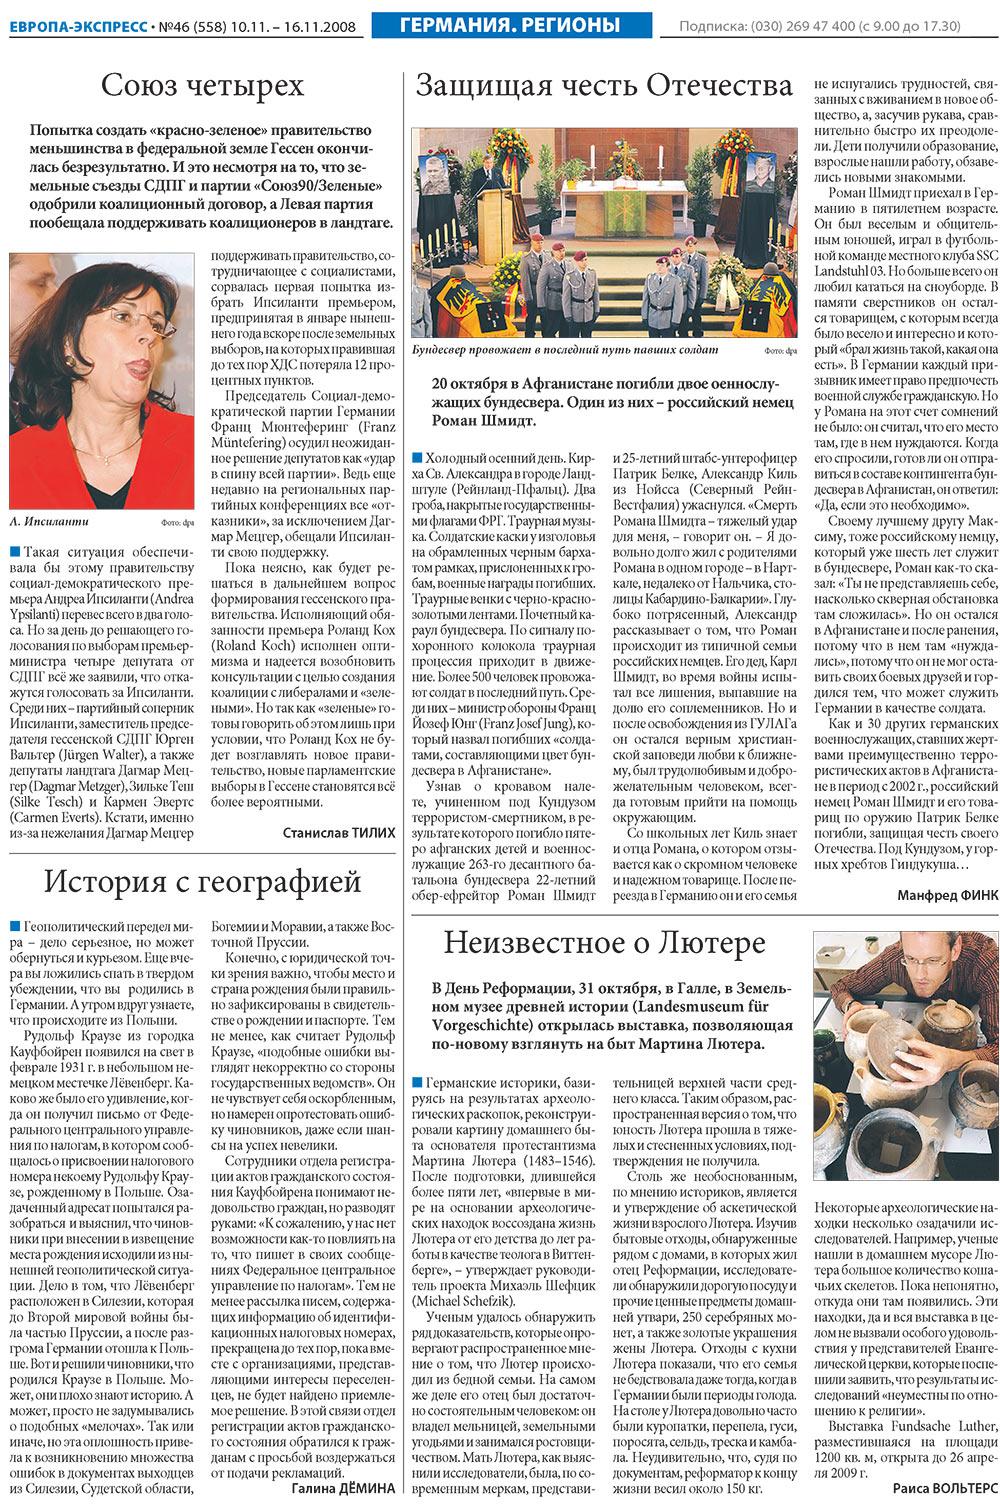 Европа экспресс (газета). 2008 год, номер 46, стр. 5